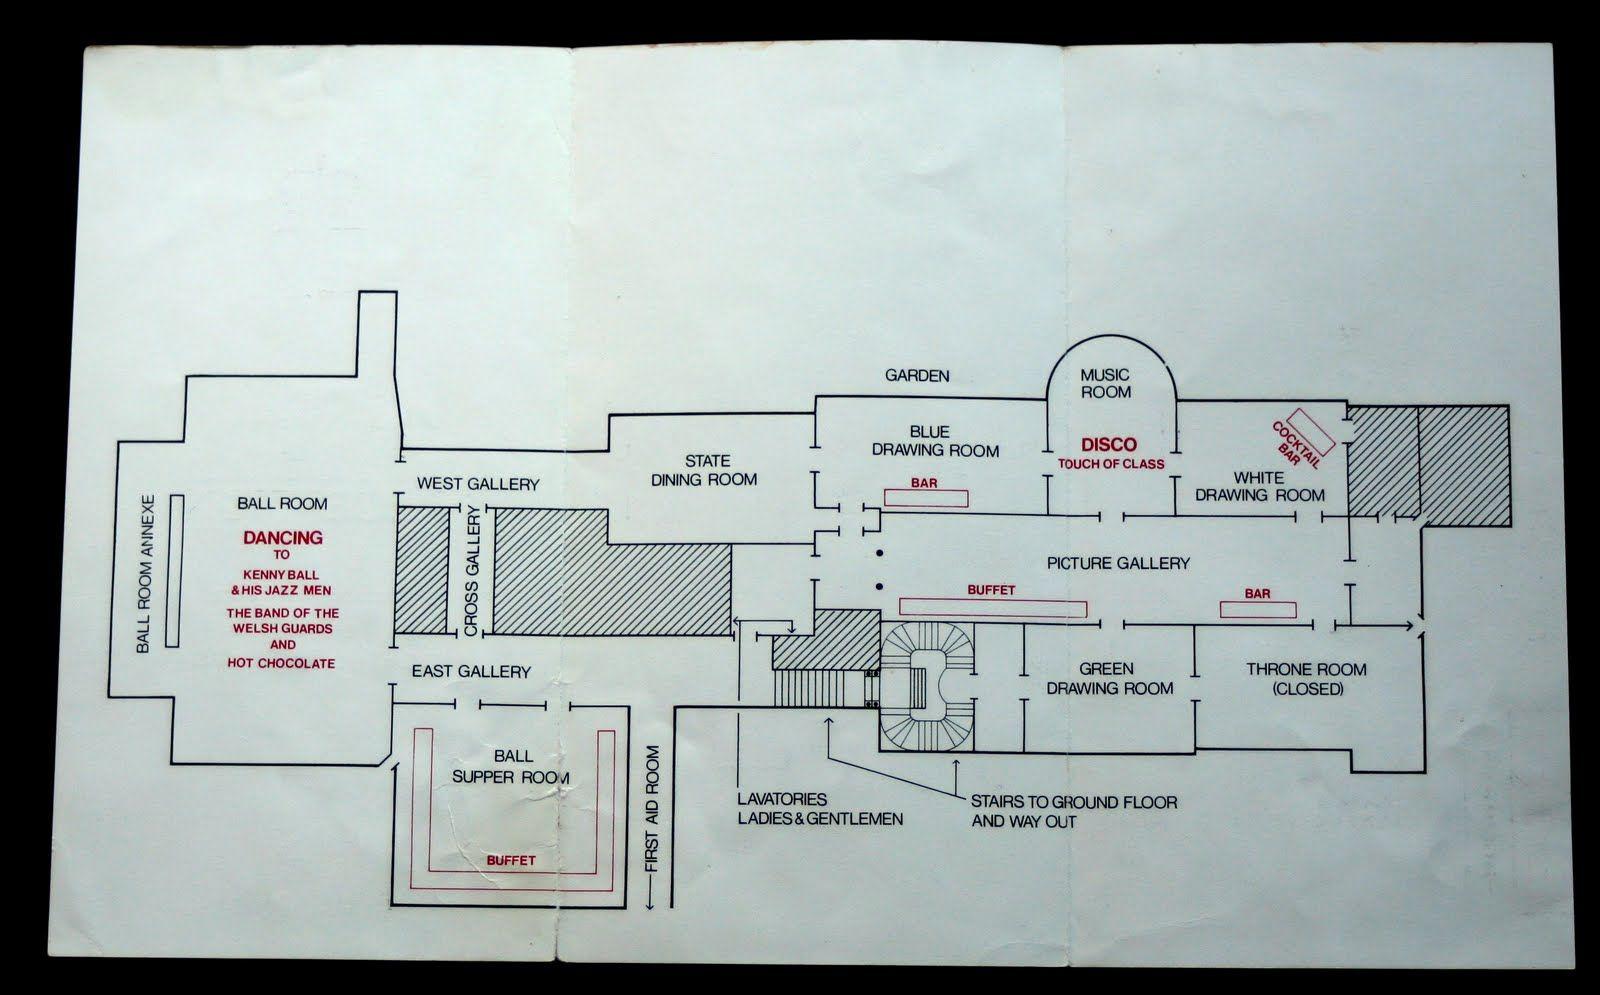 State Room Map For Royal Wedding Buckingham Palace Buckingham Palace Architecture Plan State Room